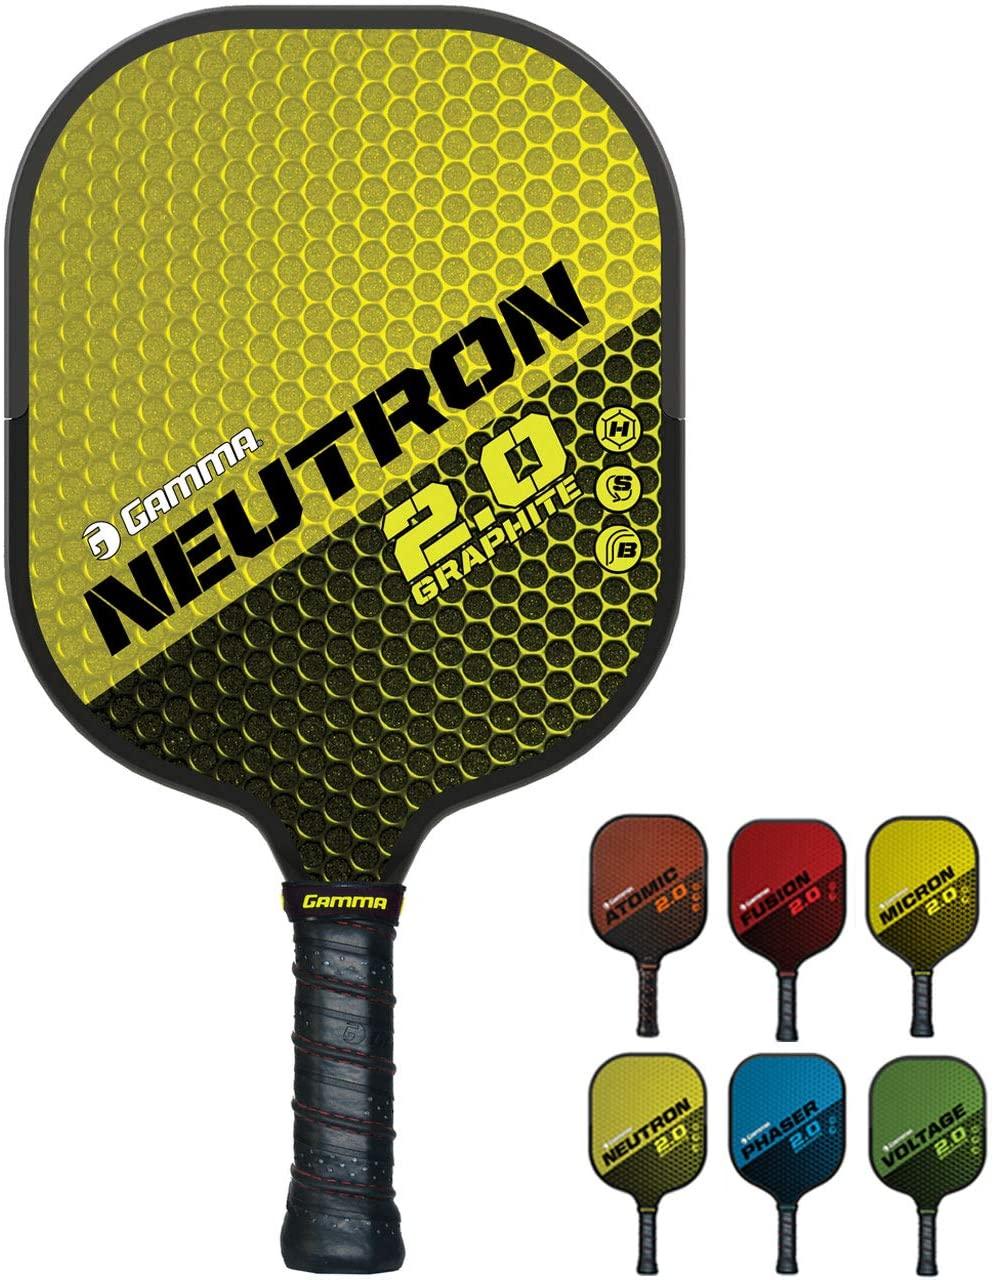 Gamma Neutron Sports 2.0 Pickleball Paddles